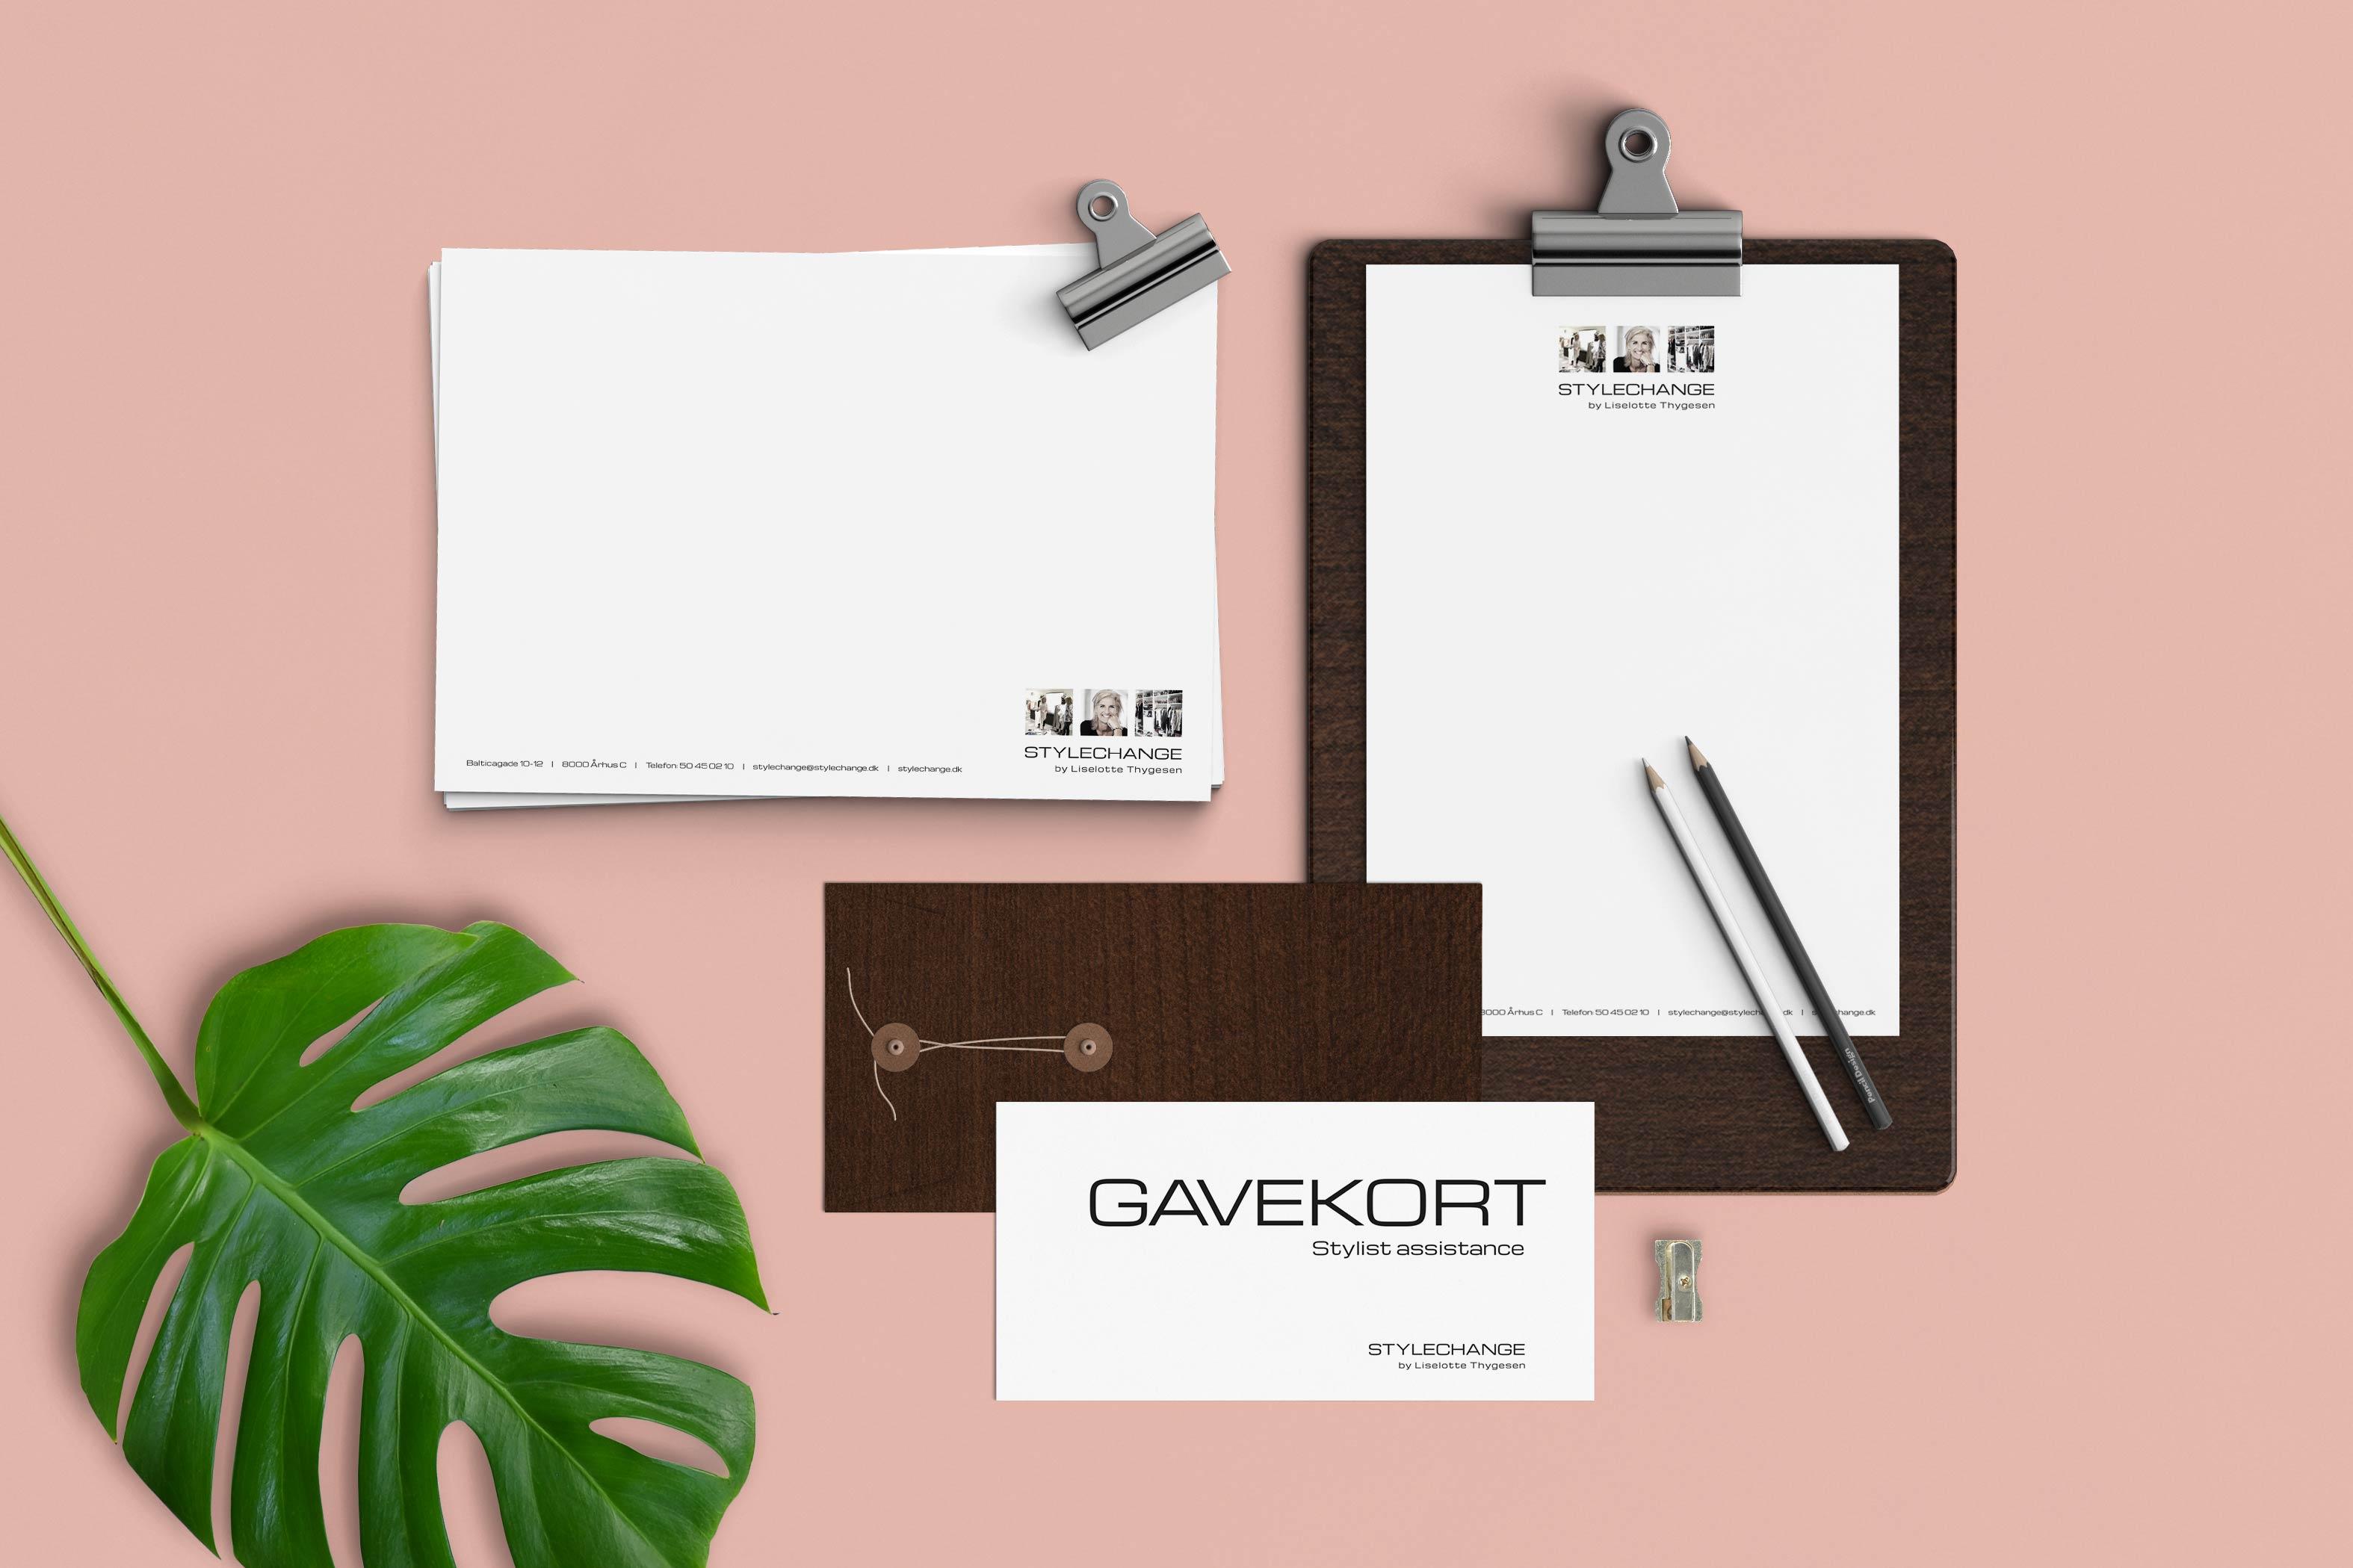 Stylechange brevpapir